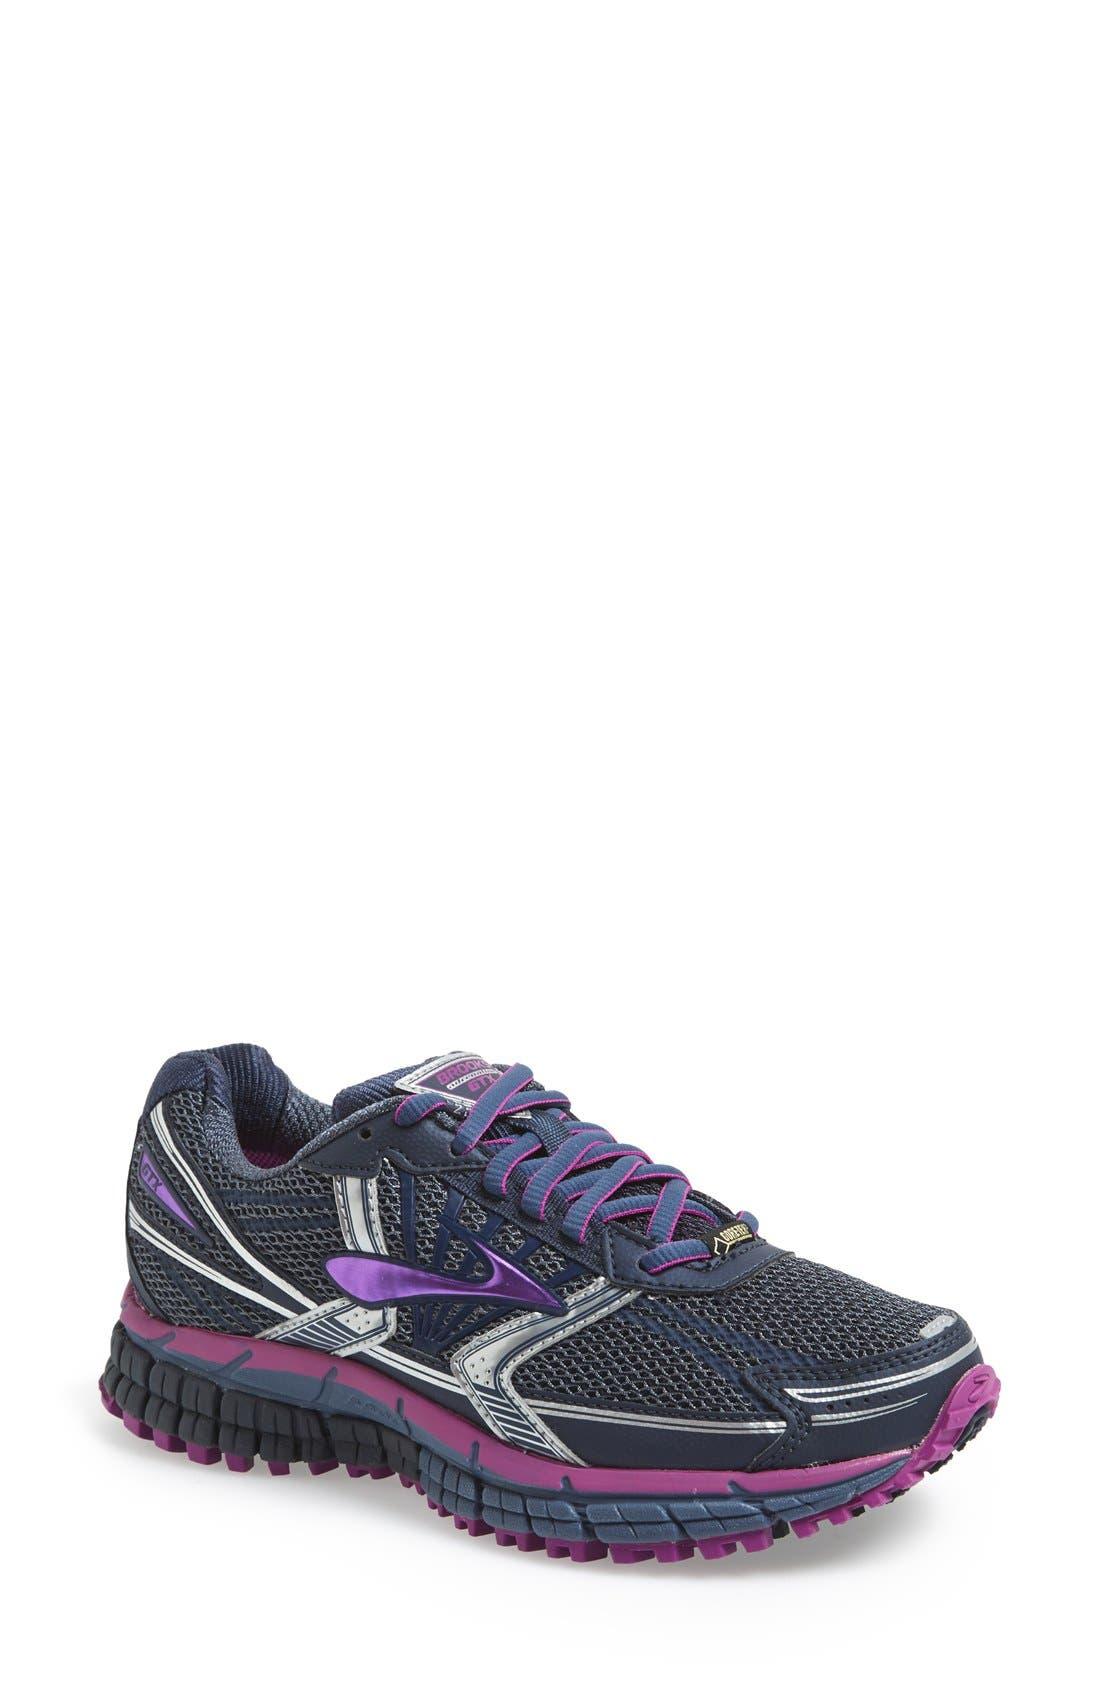 Main Image - Brooks 'Adrenaline ASR 11 GTX' Waterproof Running Shoe (Women)